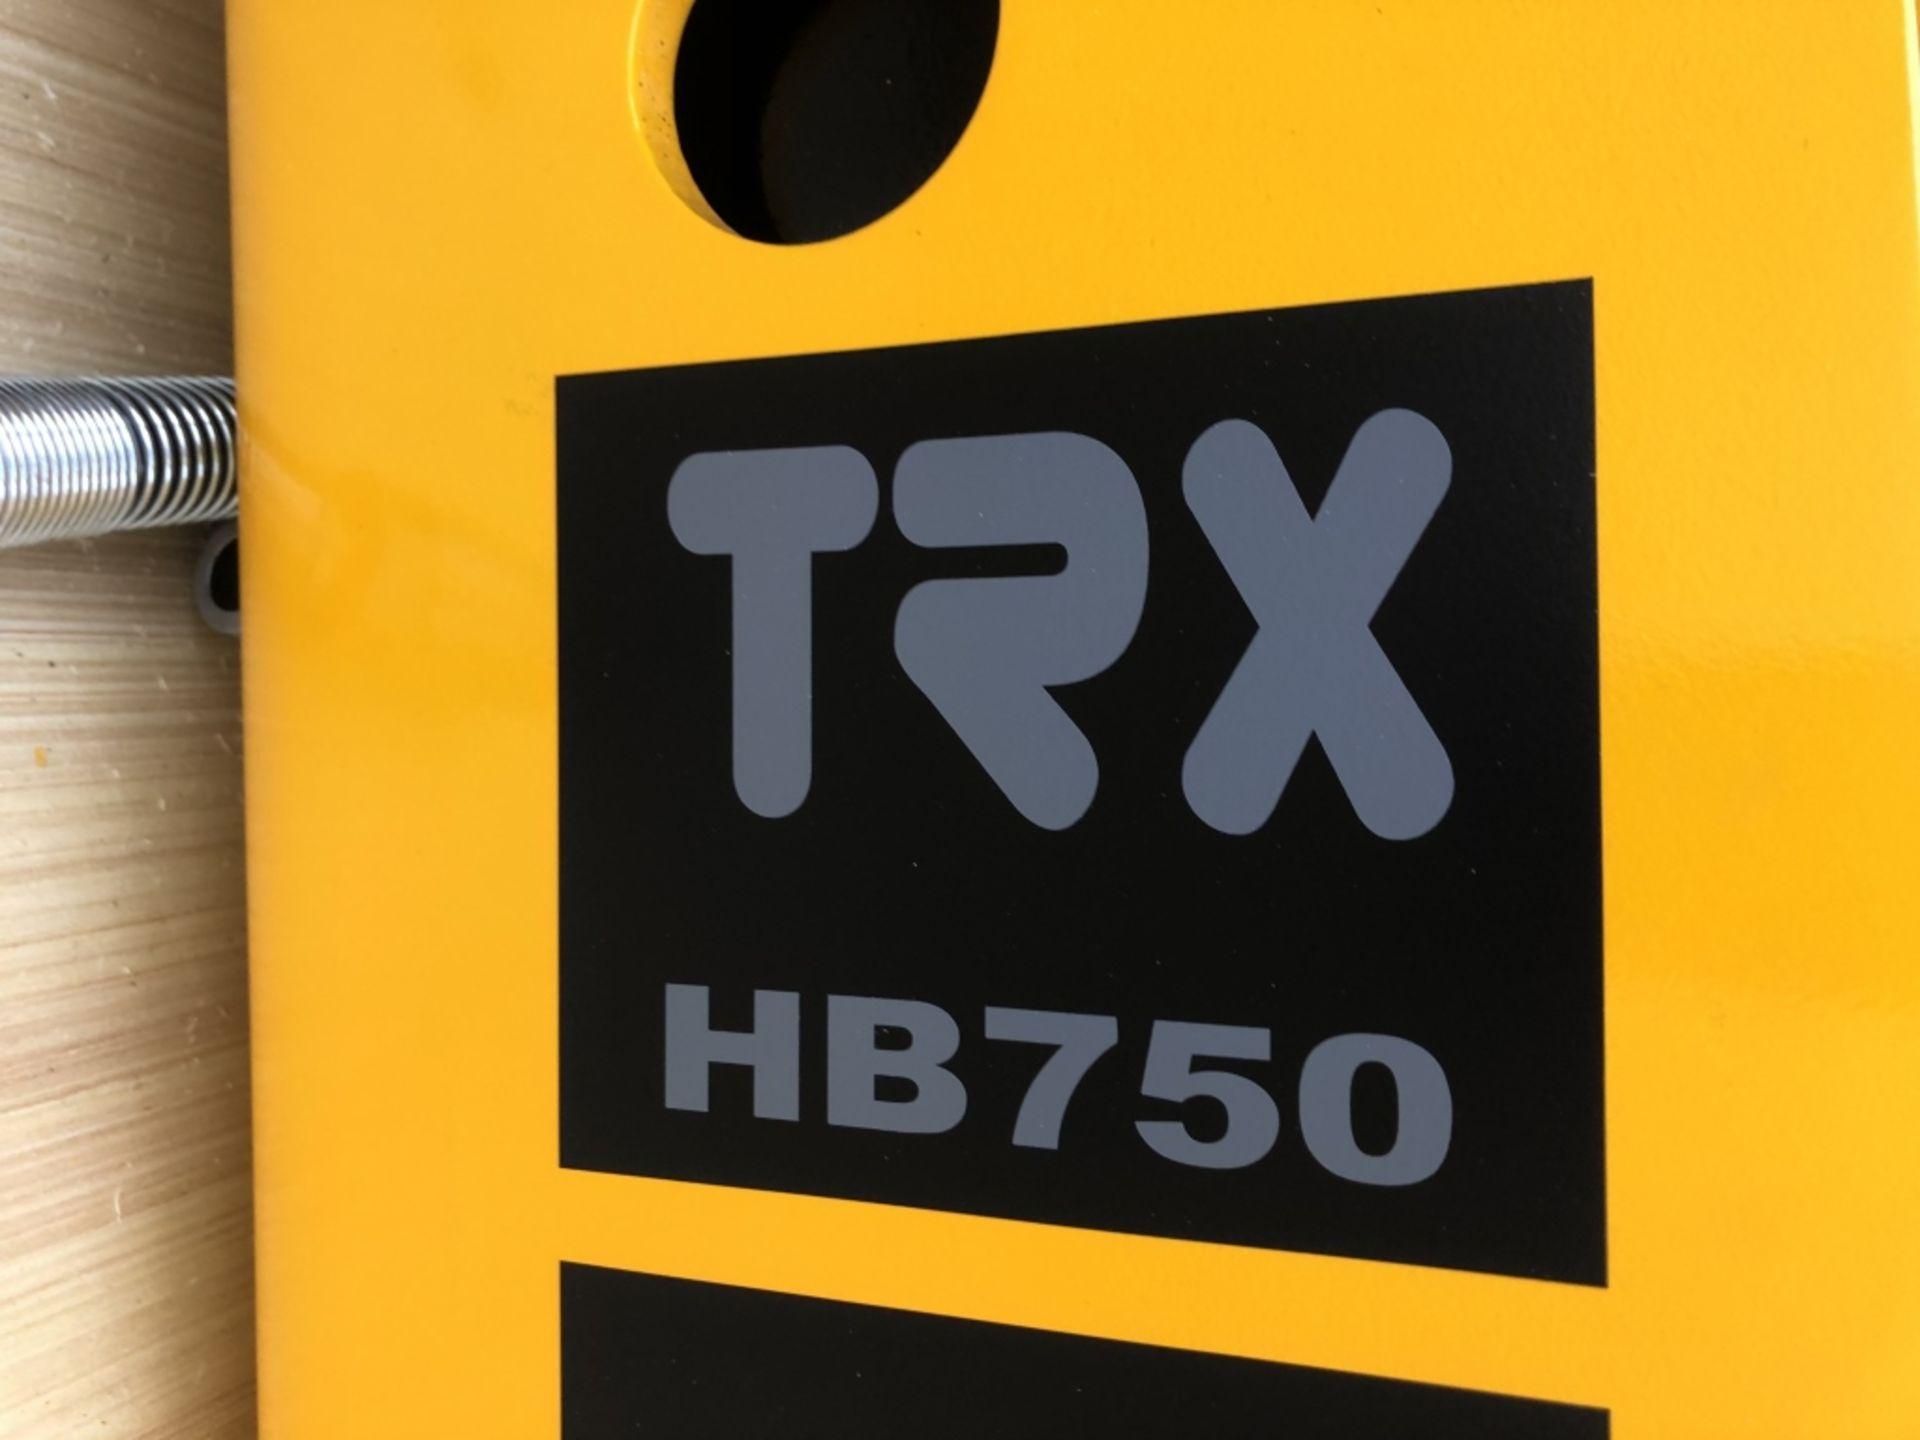 2020 TRX HB750 Hydraulic Hammer - Image 3 of 3